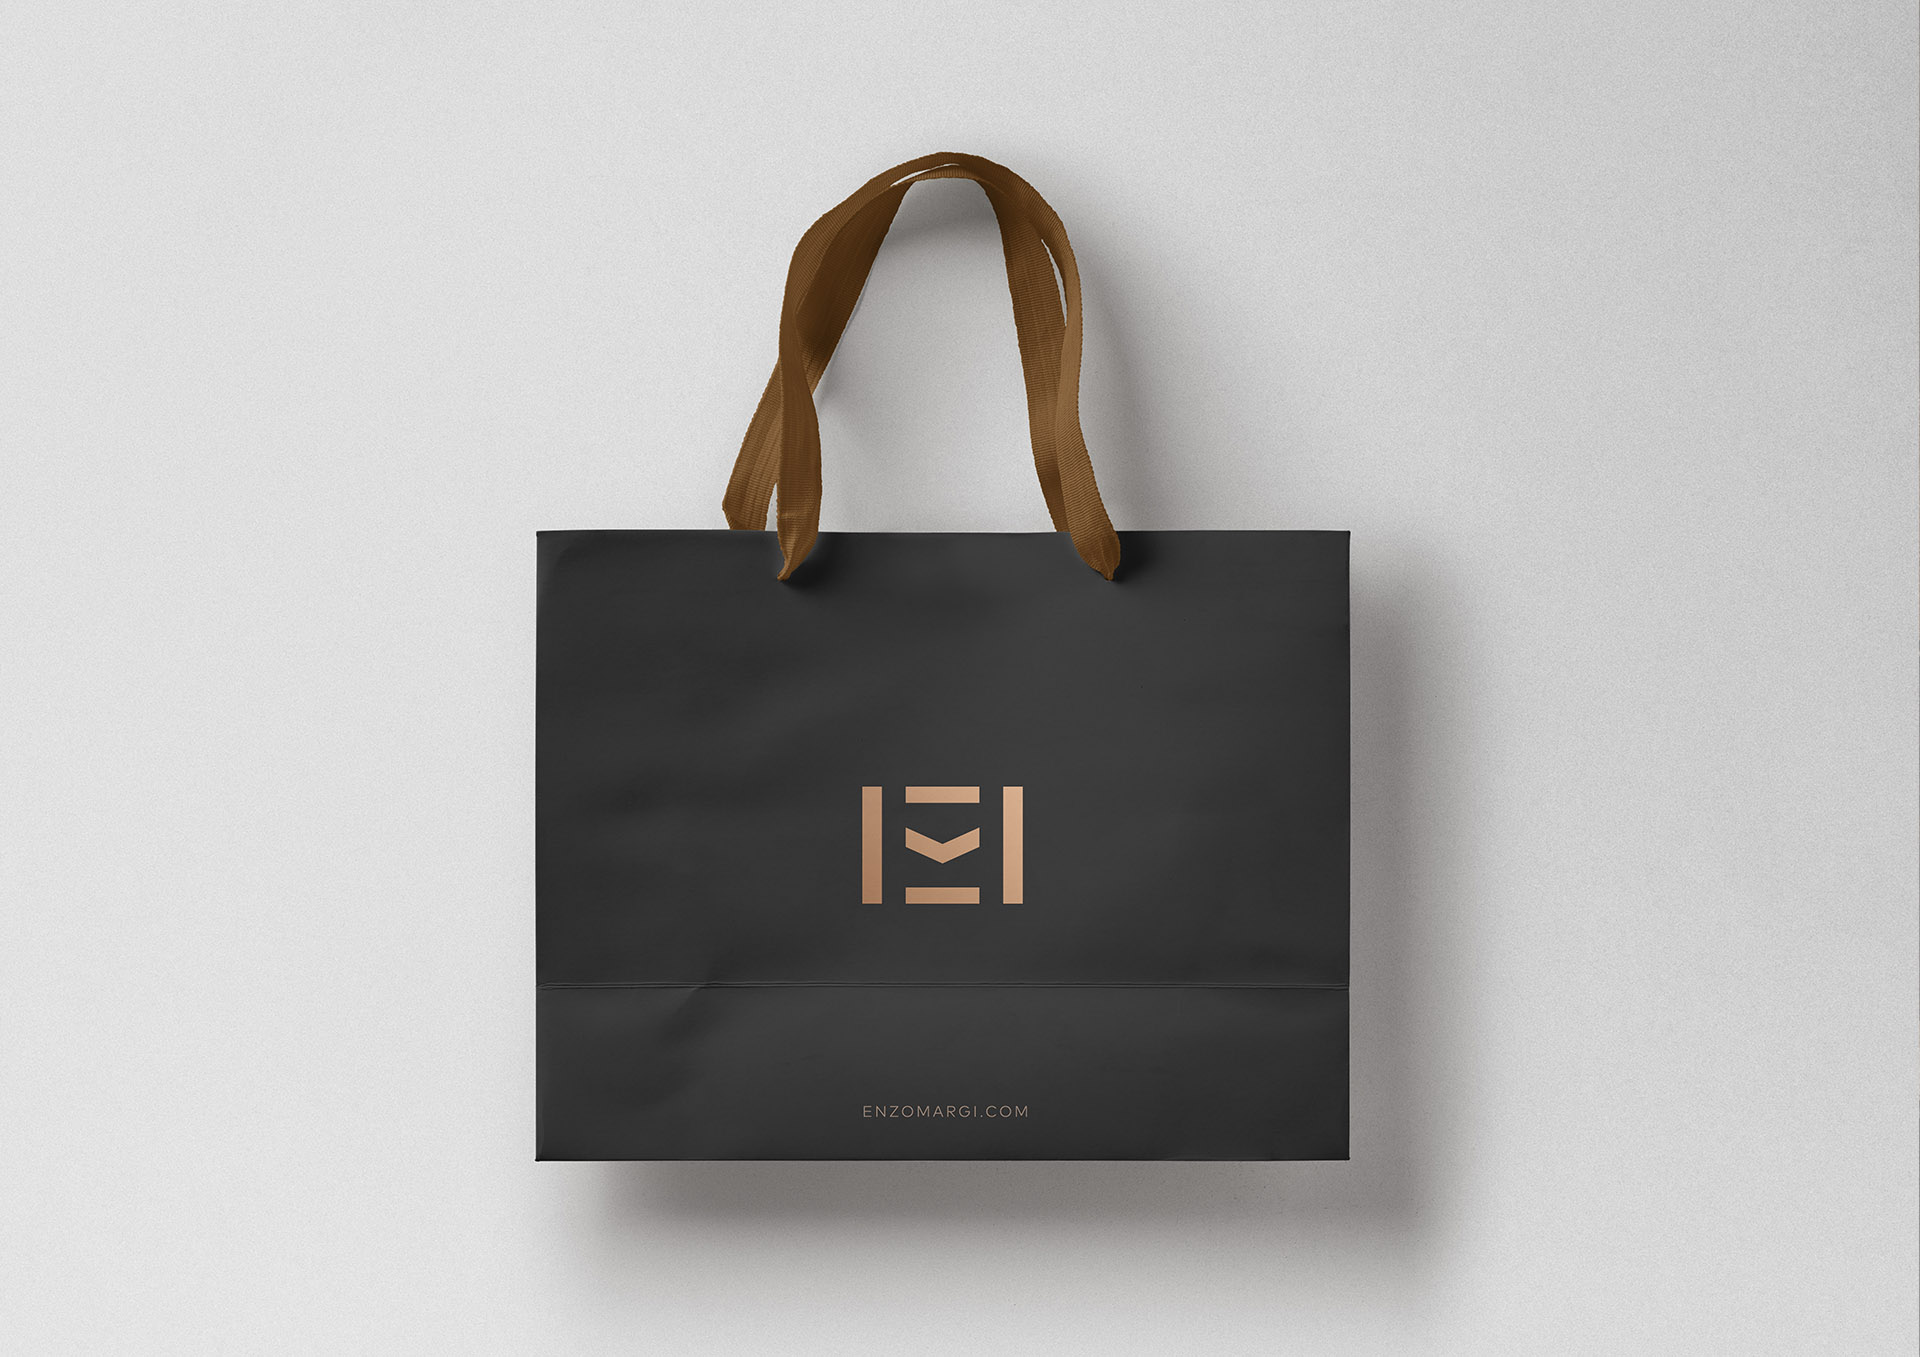 enzo margi portfoliu inoveo paper bag